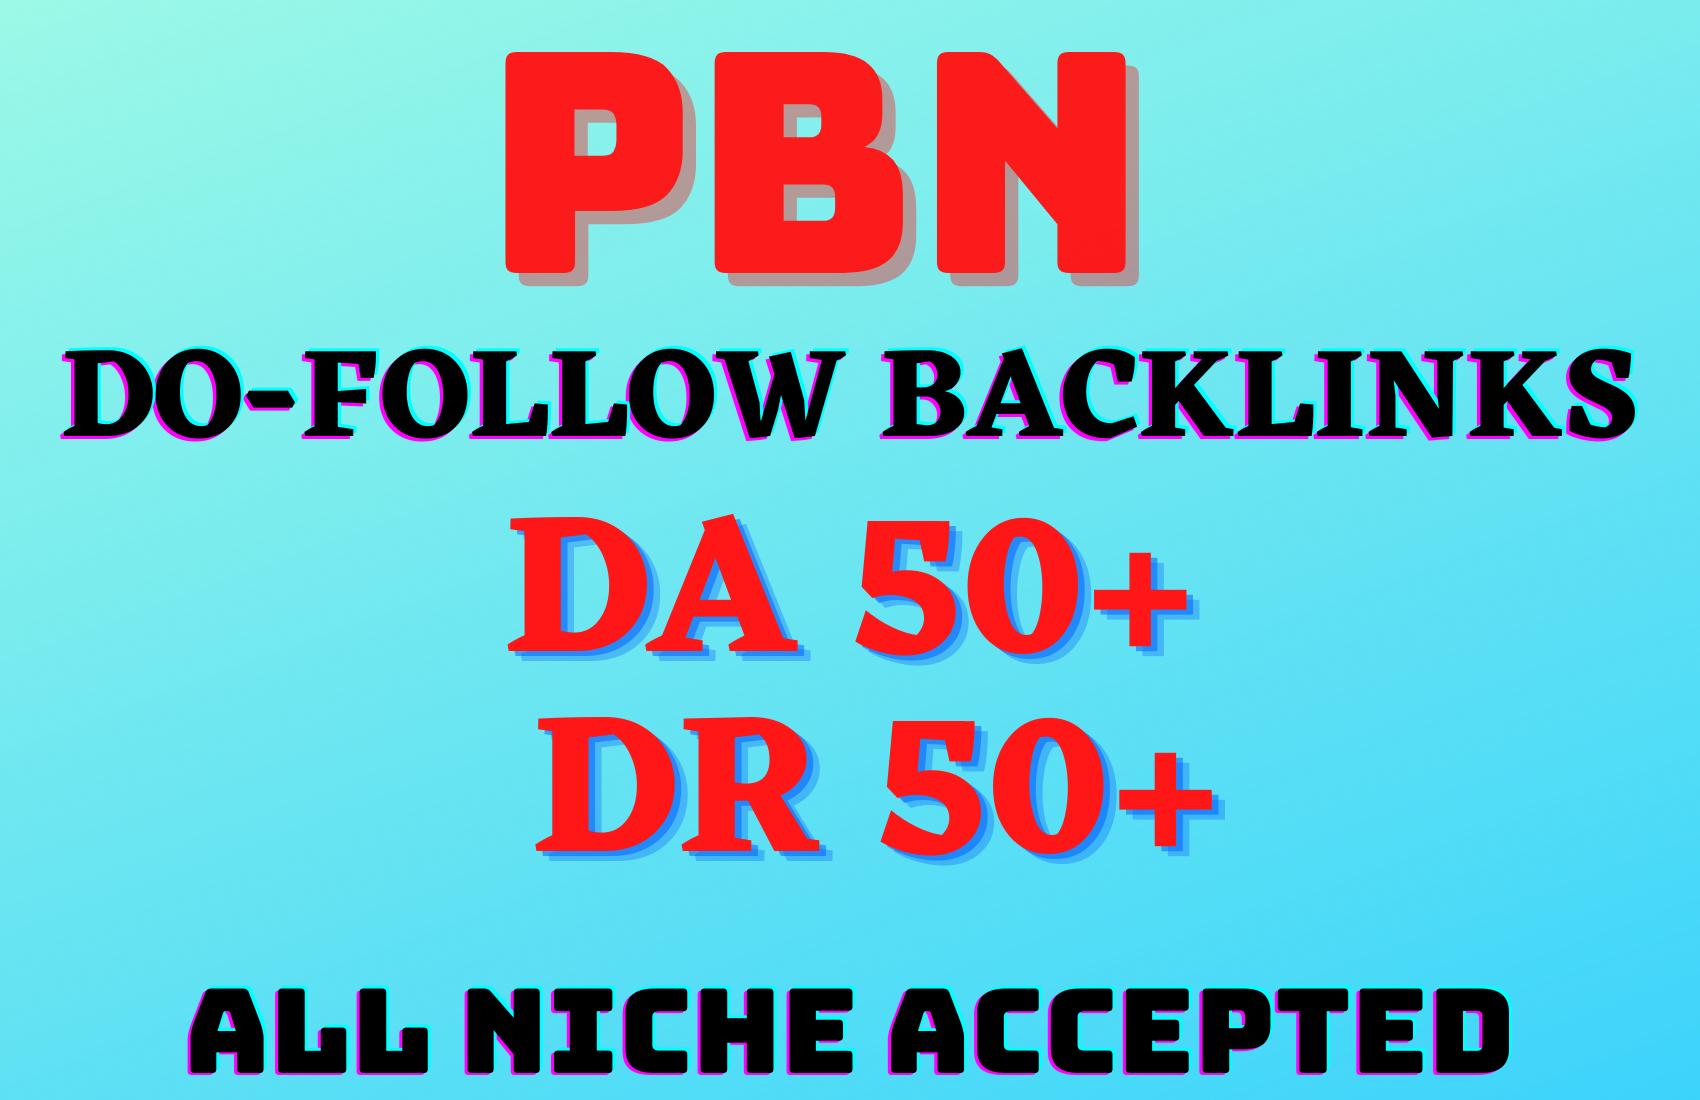 5 HQ homepage PBN backlinks from DA & DR 50+ websites